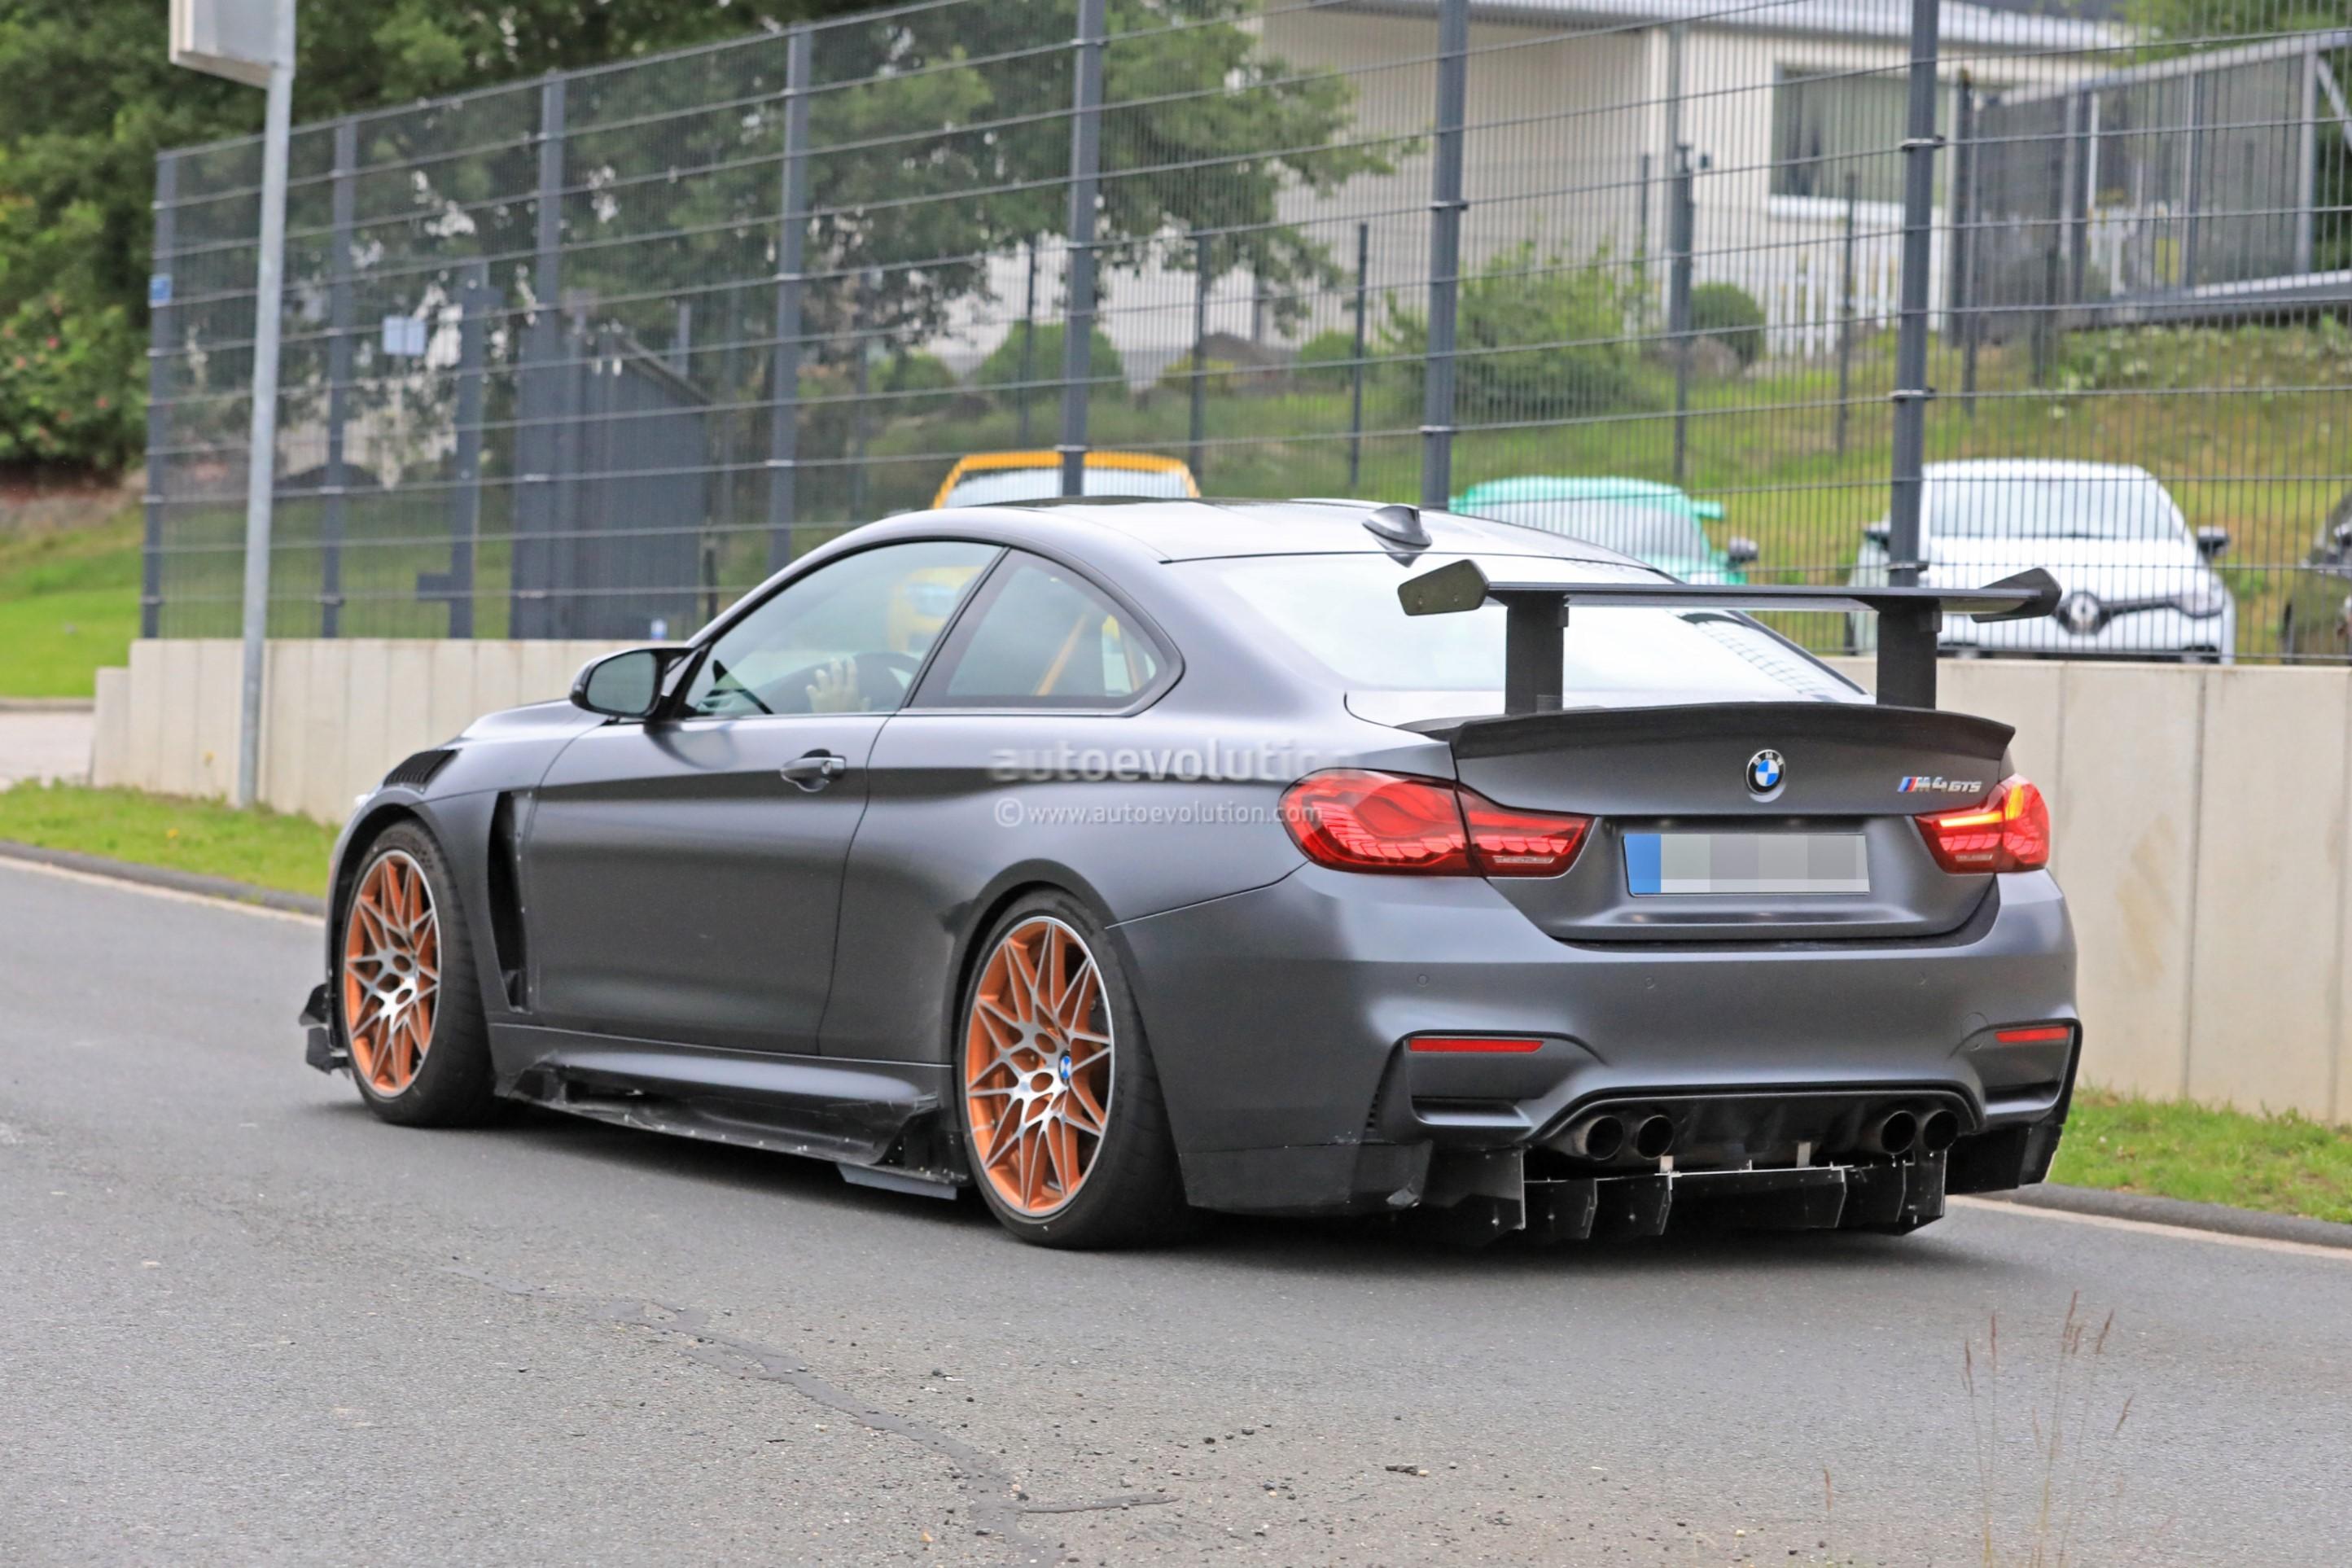 2019 Bmw M4 Cs >> Could This Prototype Be the 2019 BMW M4 CSL? - autoevolution